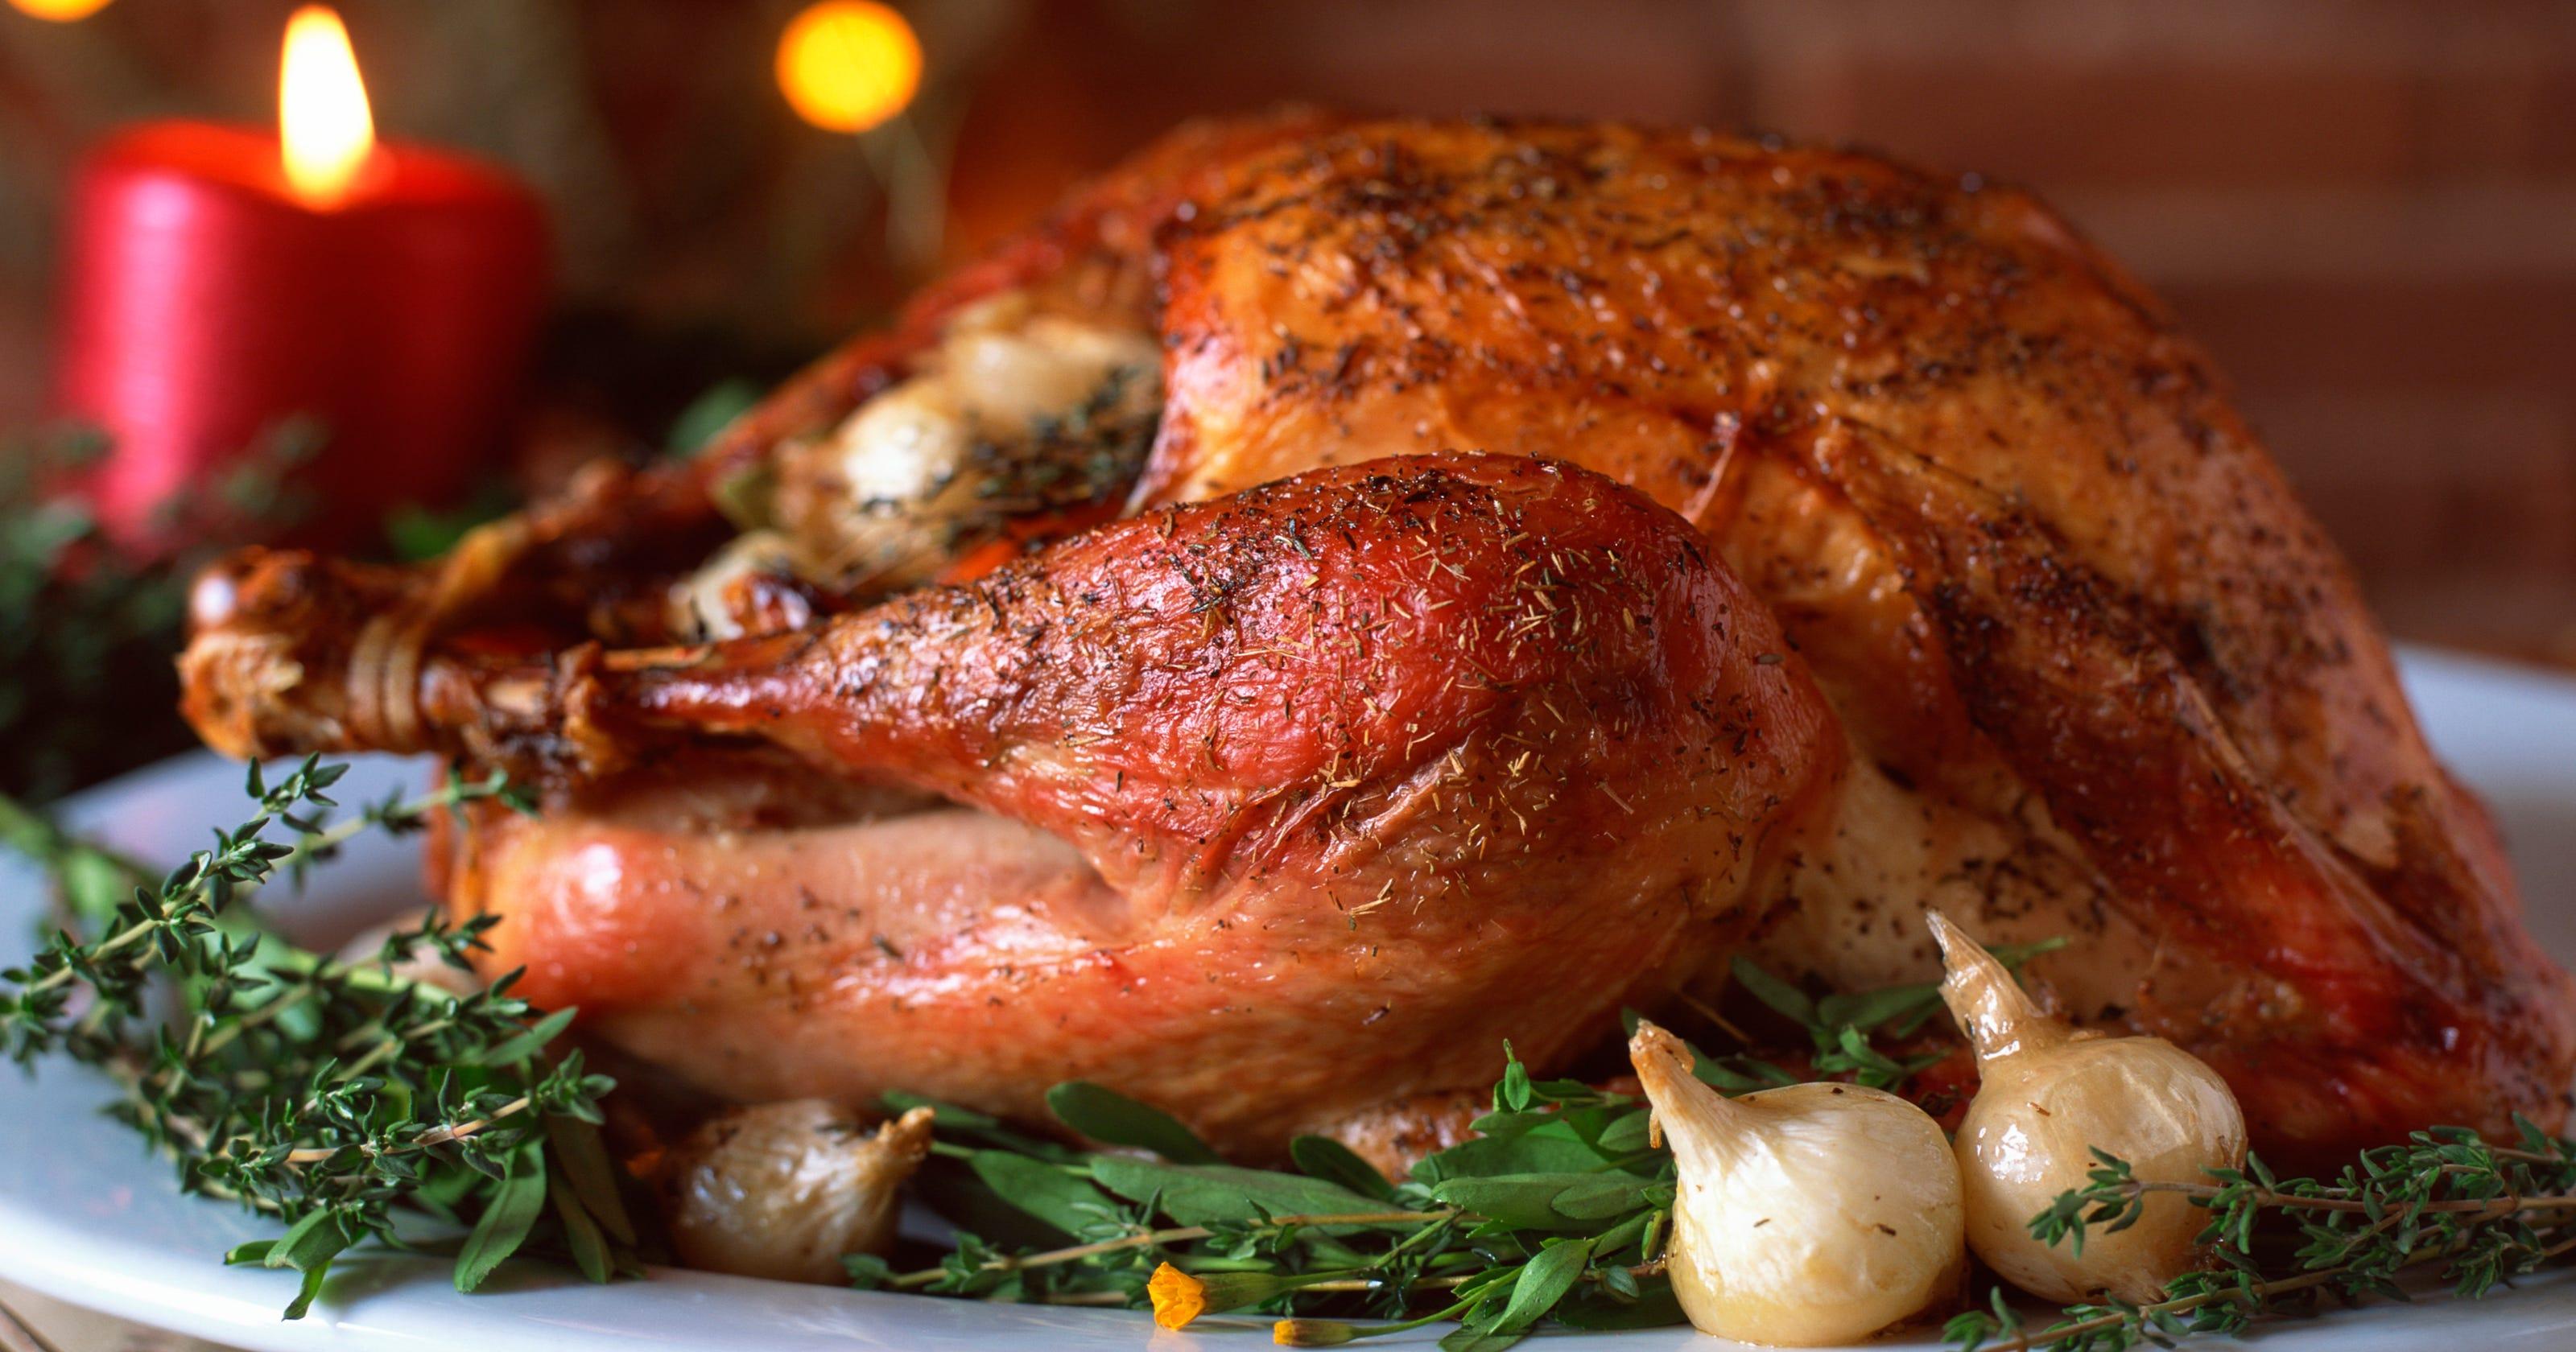 plenty of restaurants open on thanksgiving day - Is Golden Corral Open On Christmas Day 2014